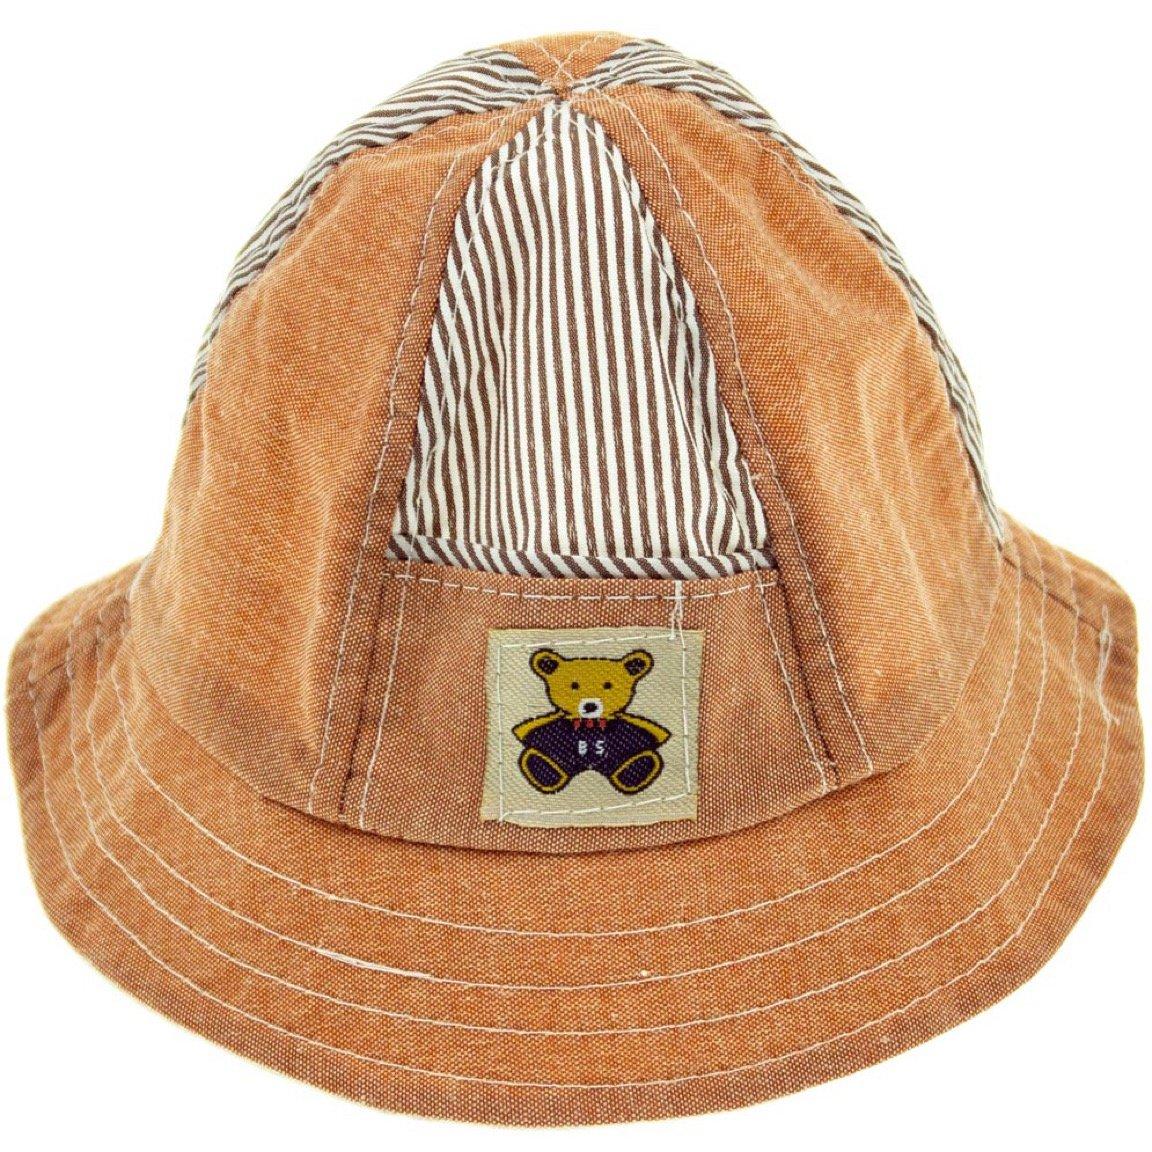 Georgia Accessories παιδικό καπέλο «Orange Teddy»